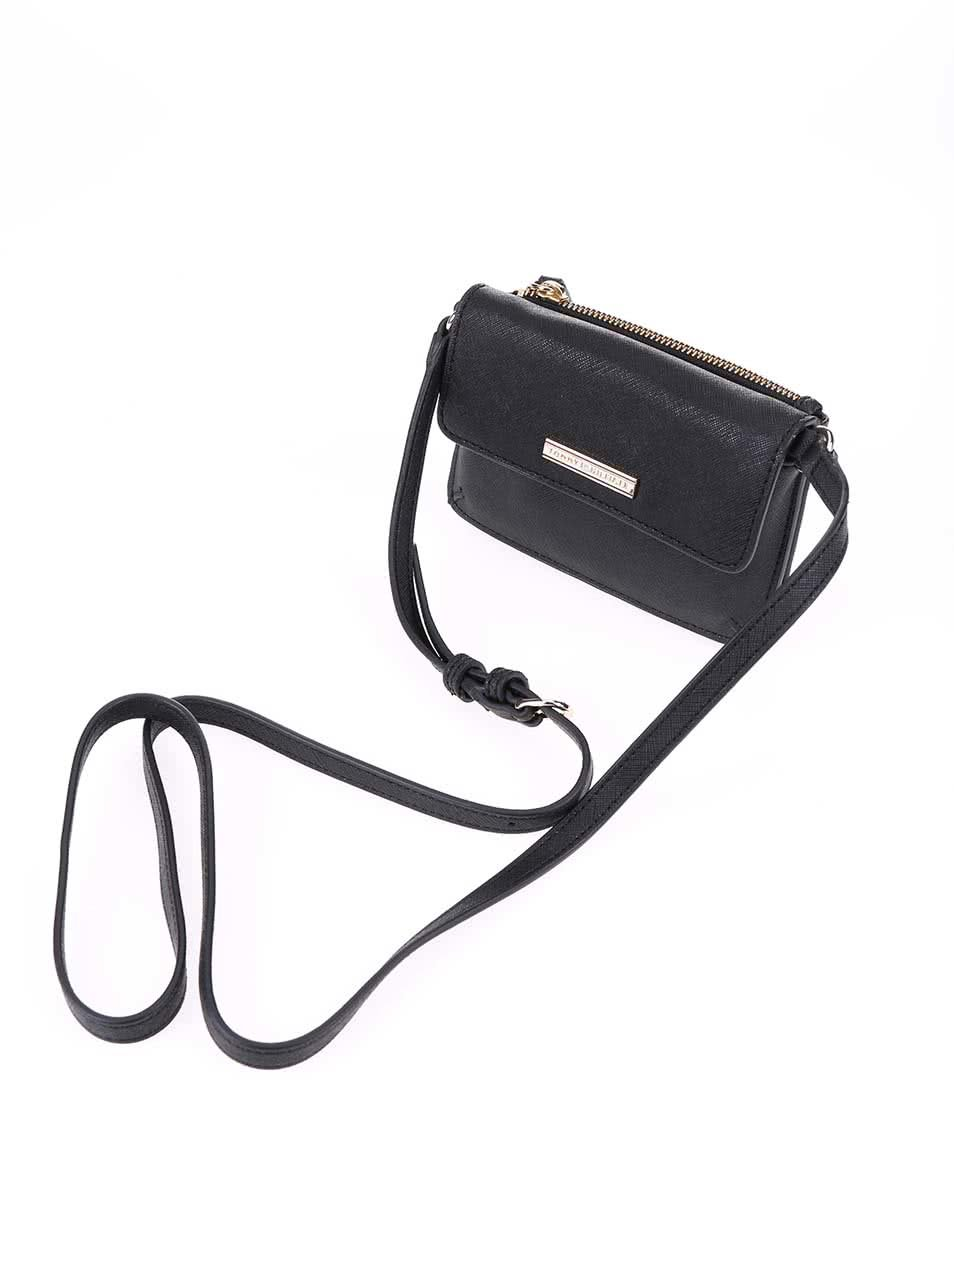 Čierna menšia kabelka cez rameno Tommy Hilfiger Honey ... 39657c16d9f